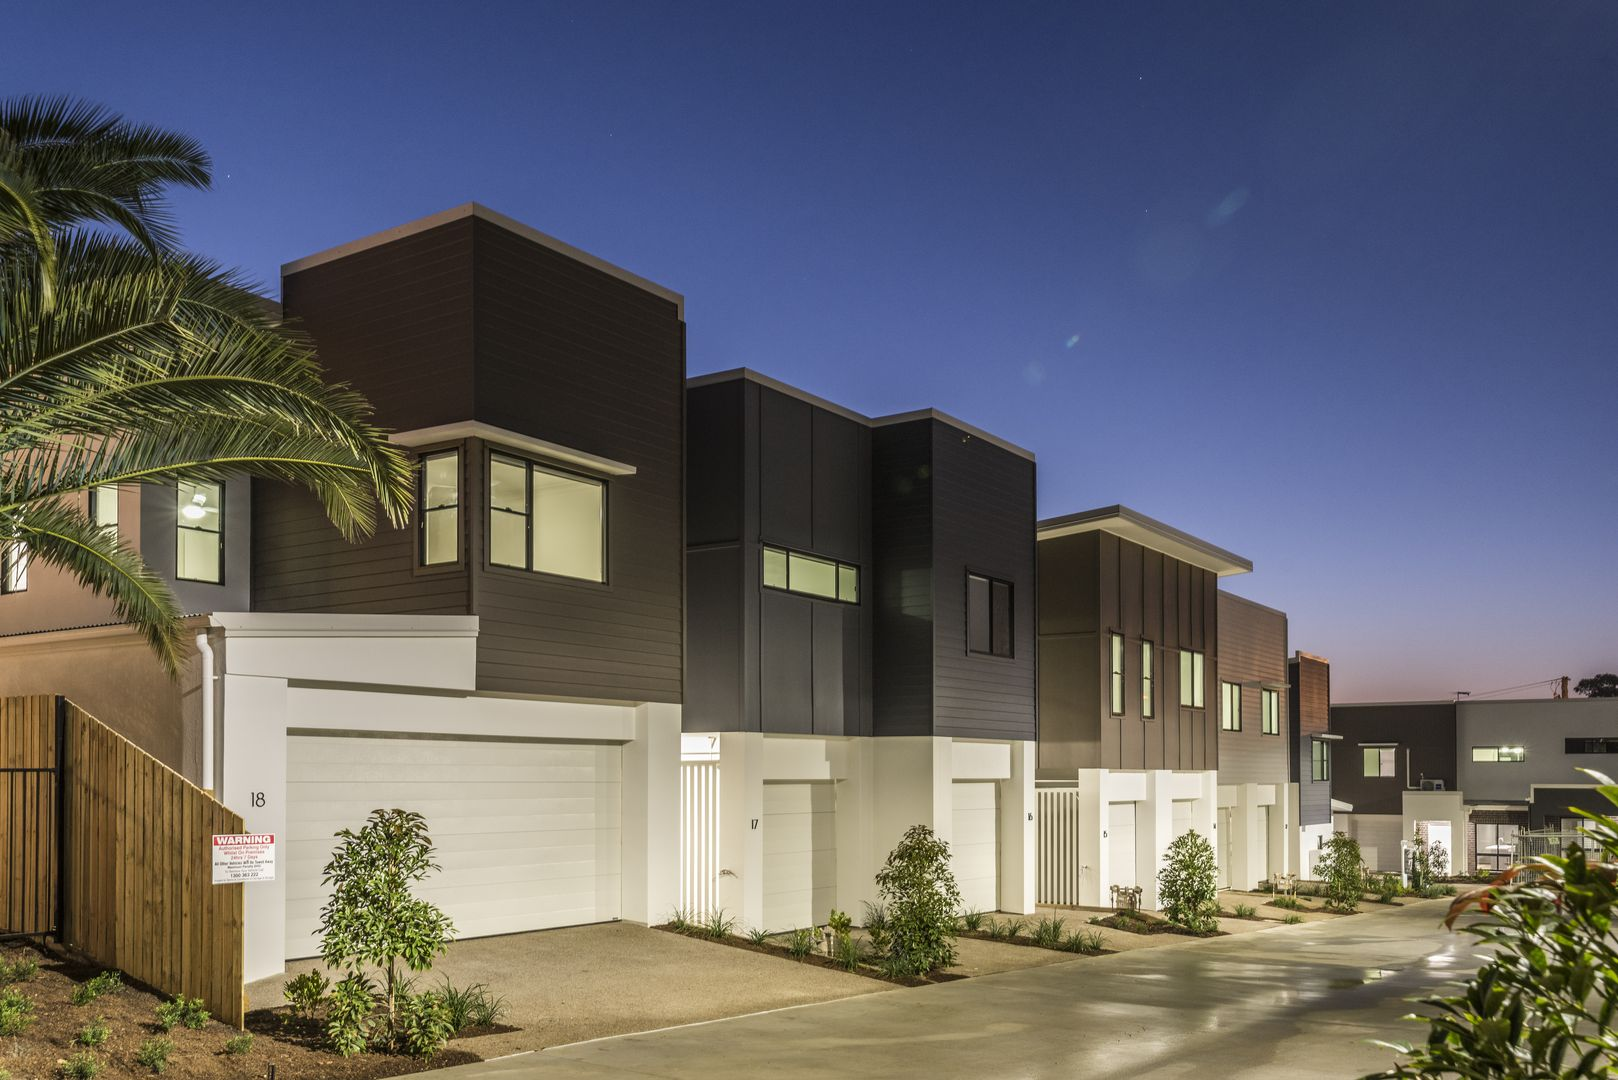 36/7 Giosam Street, Richlands QLD 4077, Image 0